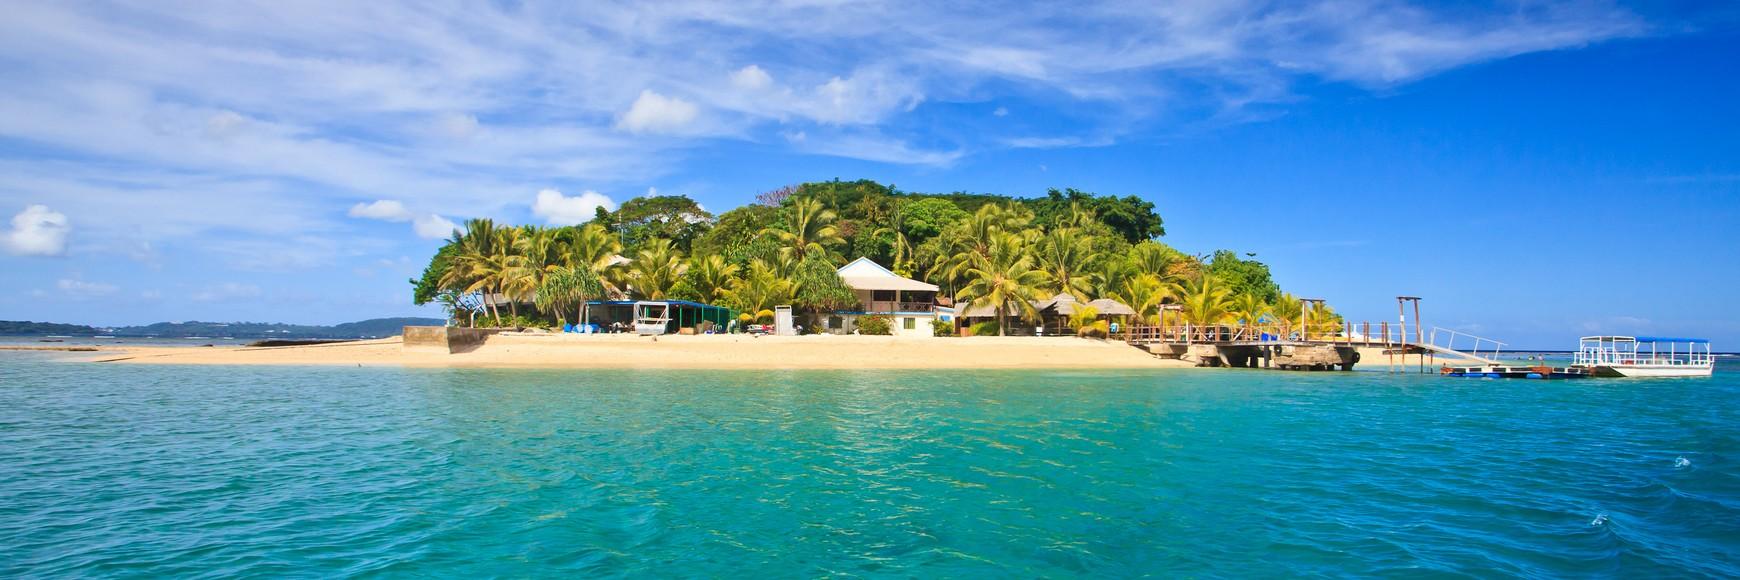 noleggio barca a vela Vanuatu